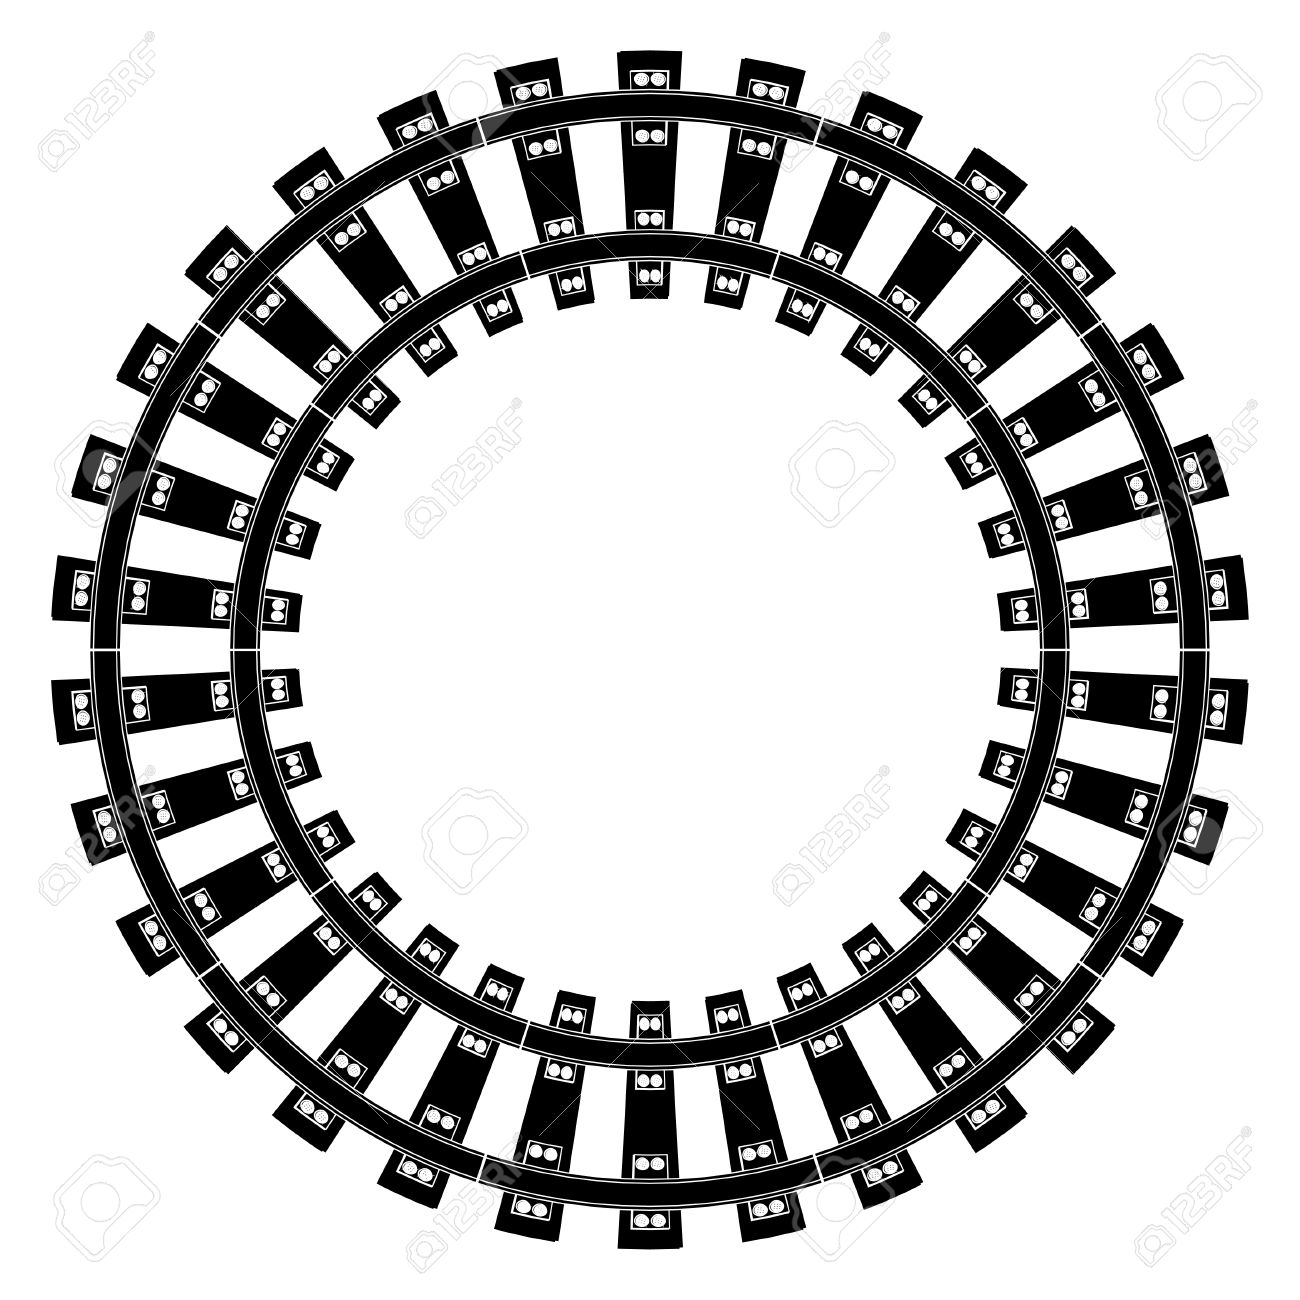 train tracks royalty free cliparts vectors and stock illustration rh 123rf com train track clipart images train track clipart black and white